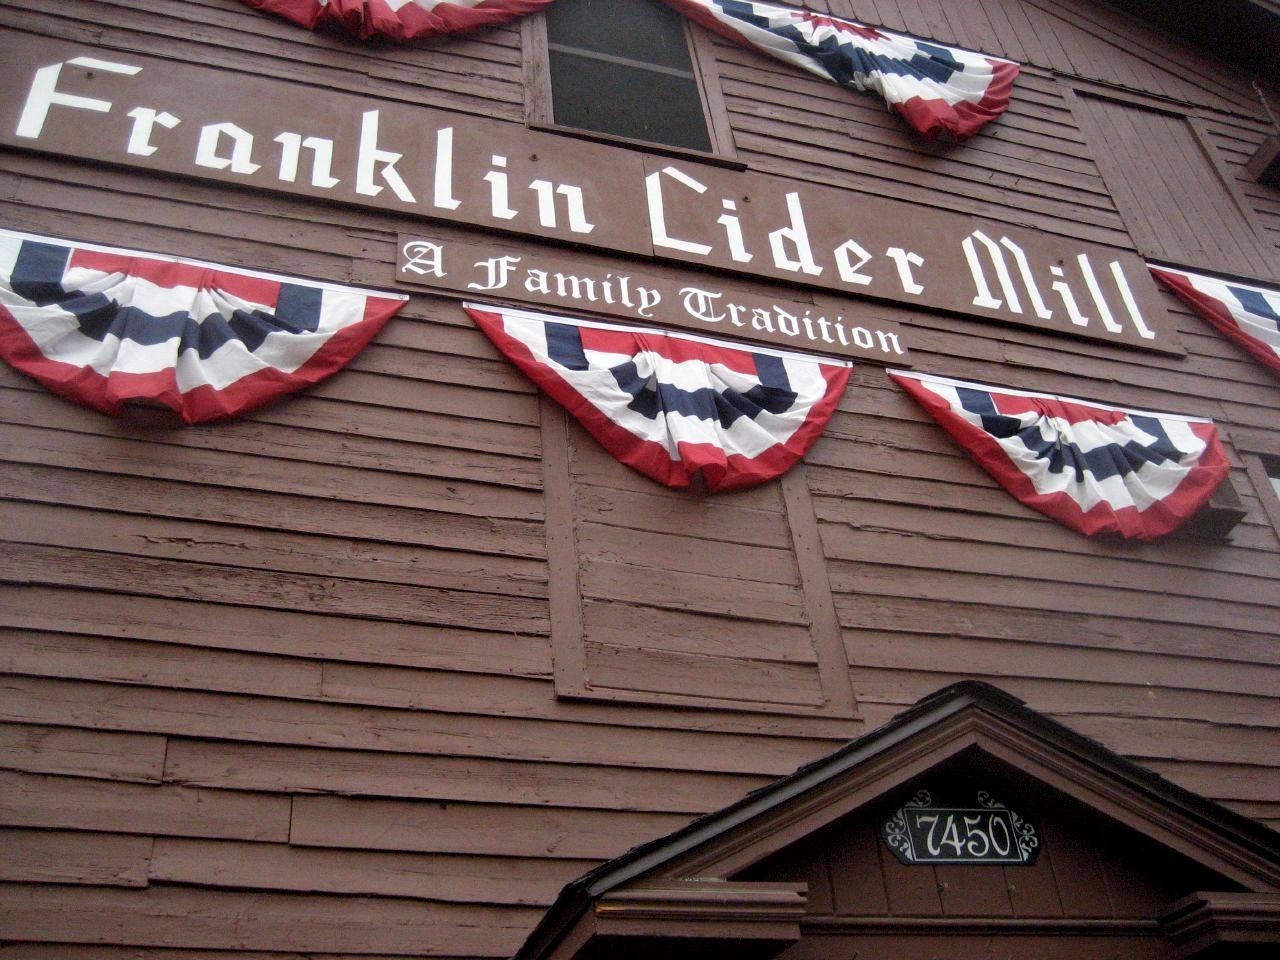 040212-shows-lets-stay-together-detroit-honeymoon-franklin-cider-mill.jpg